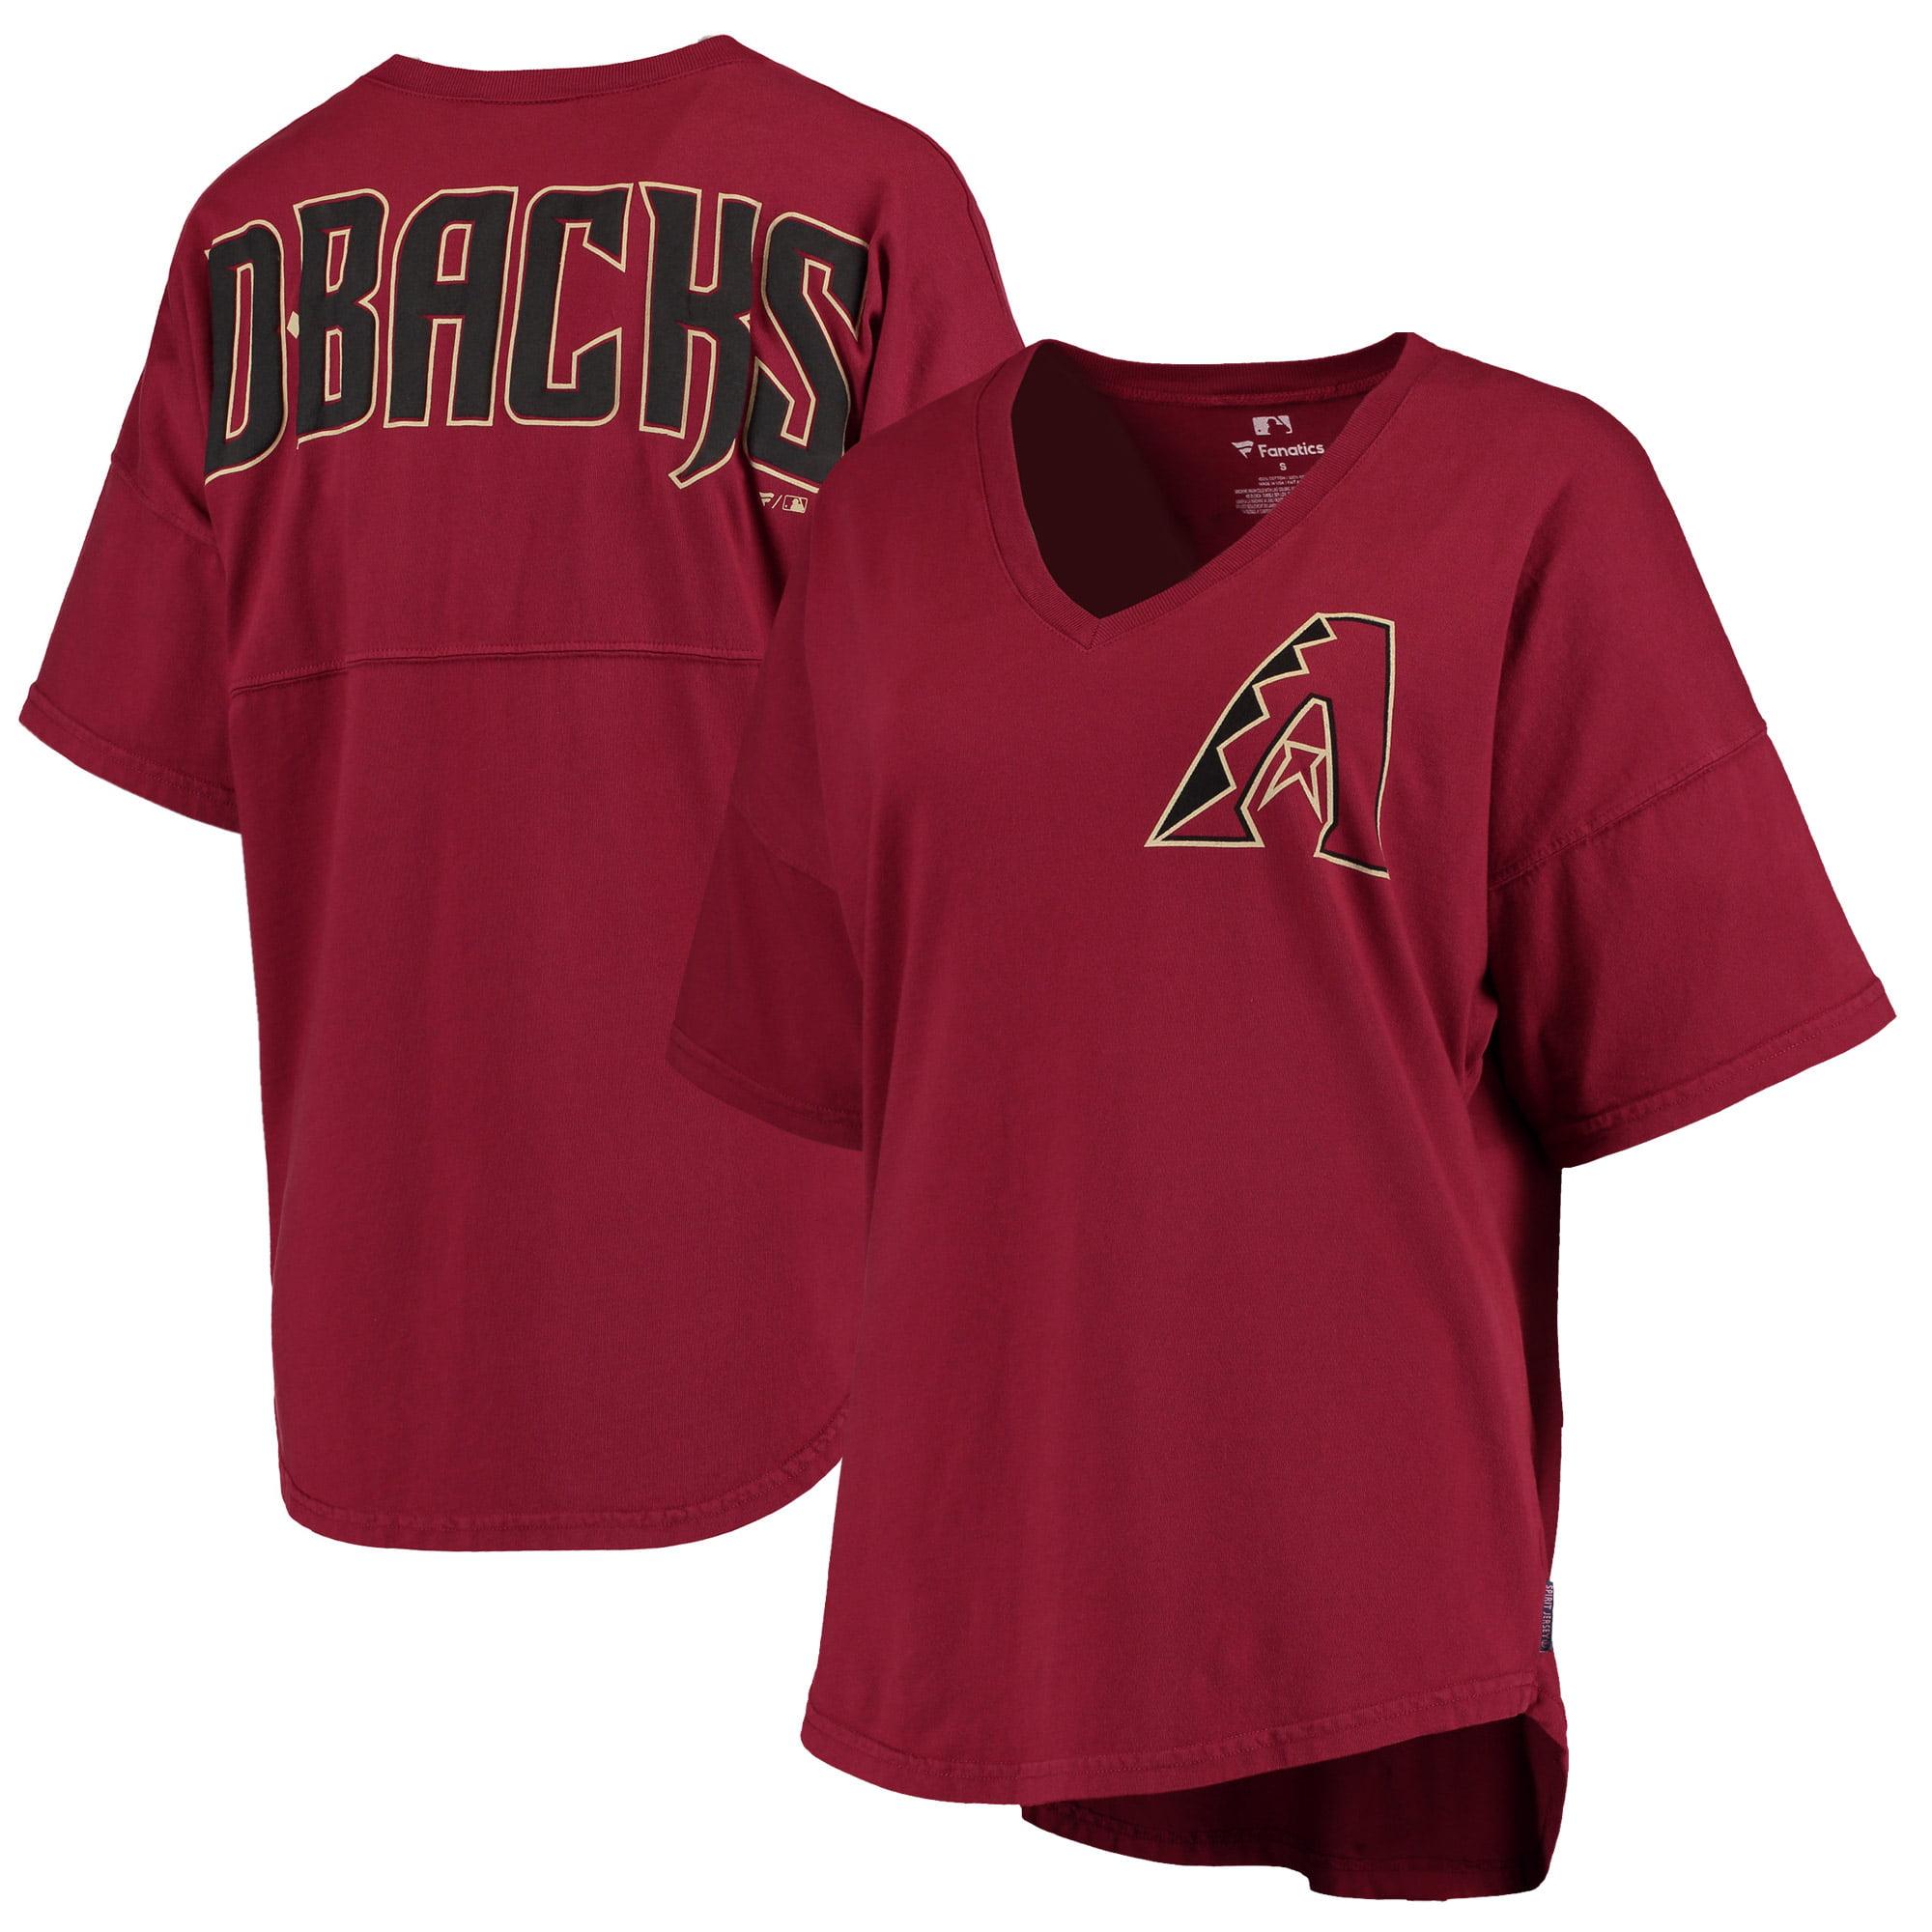 Women's Red Arizona Diamondbacks Oversized Spirit Jersey V-Neck T-Shirt